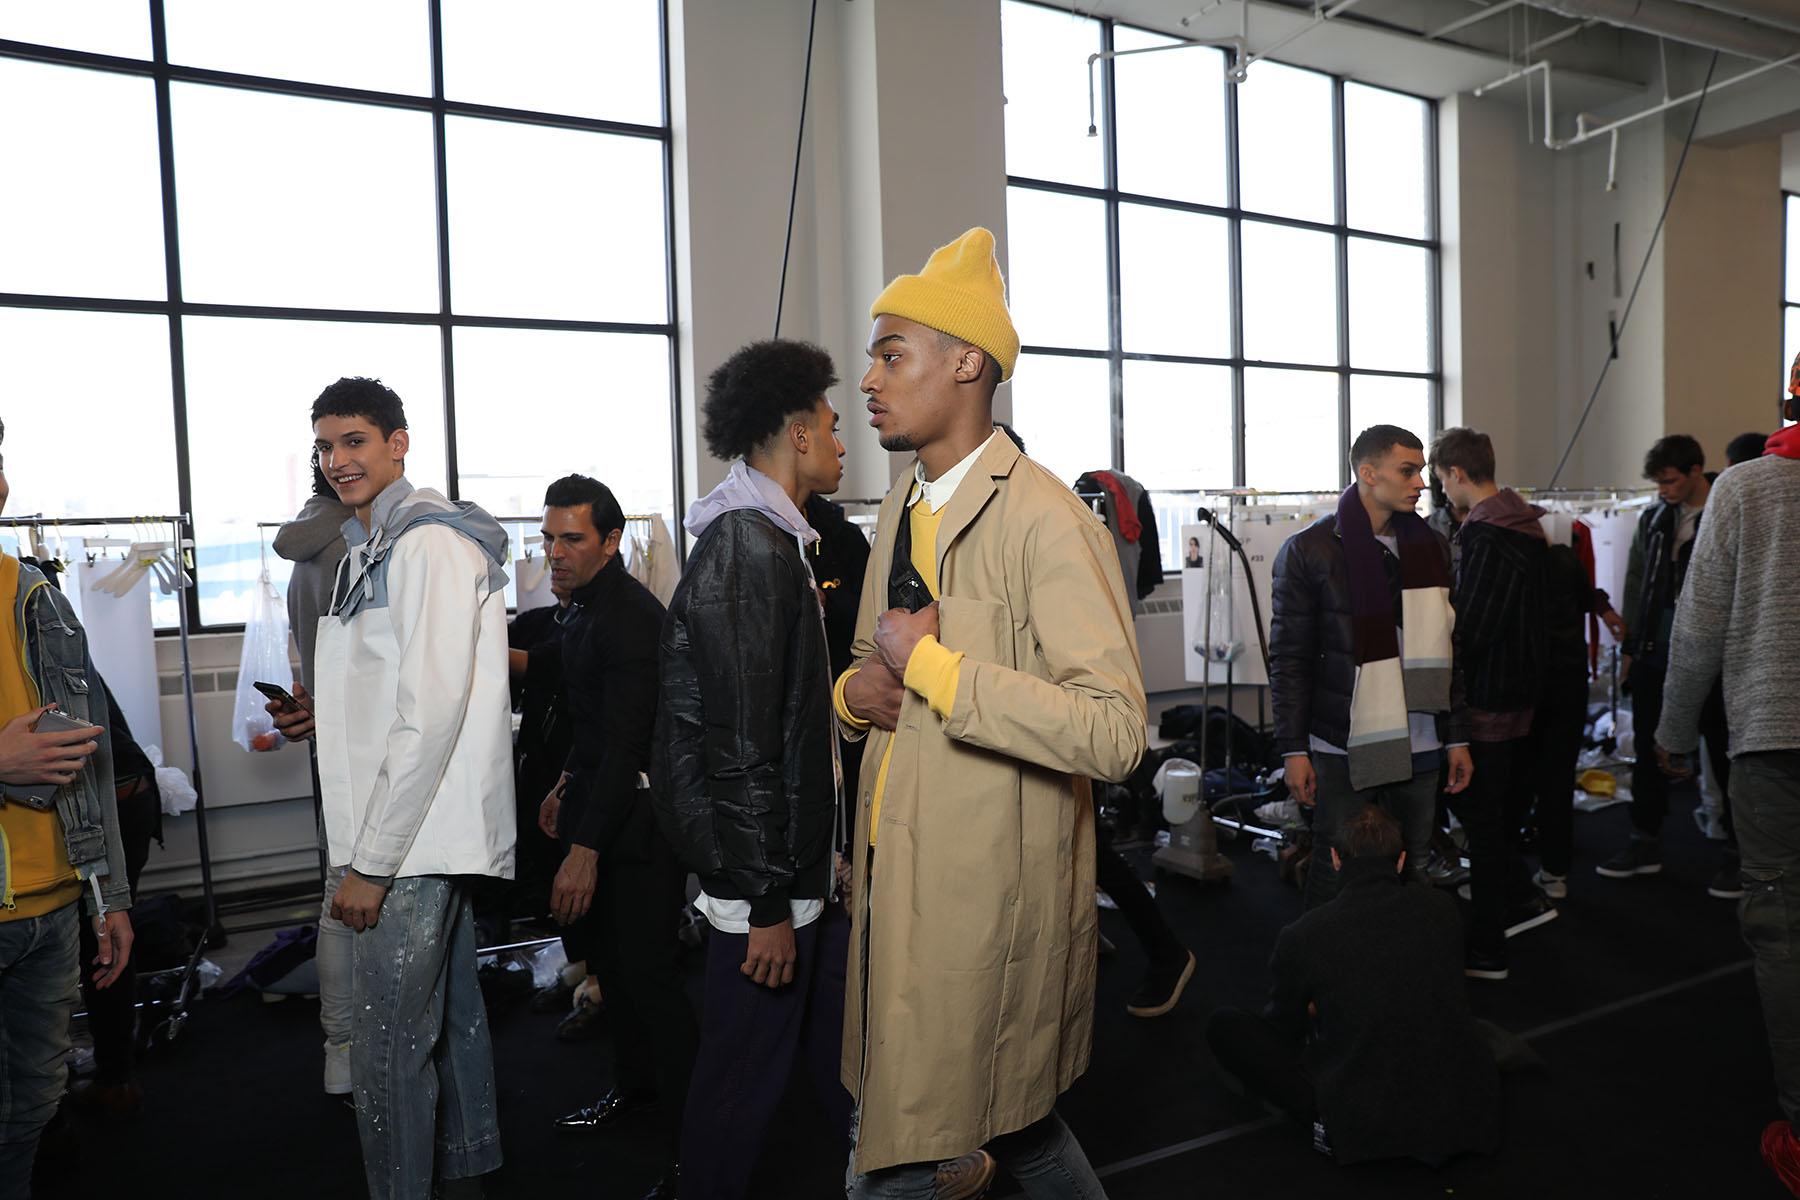 John-Elliott-Fall-2017-mens-fashion-show-backstage-the-impression-060